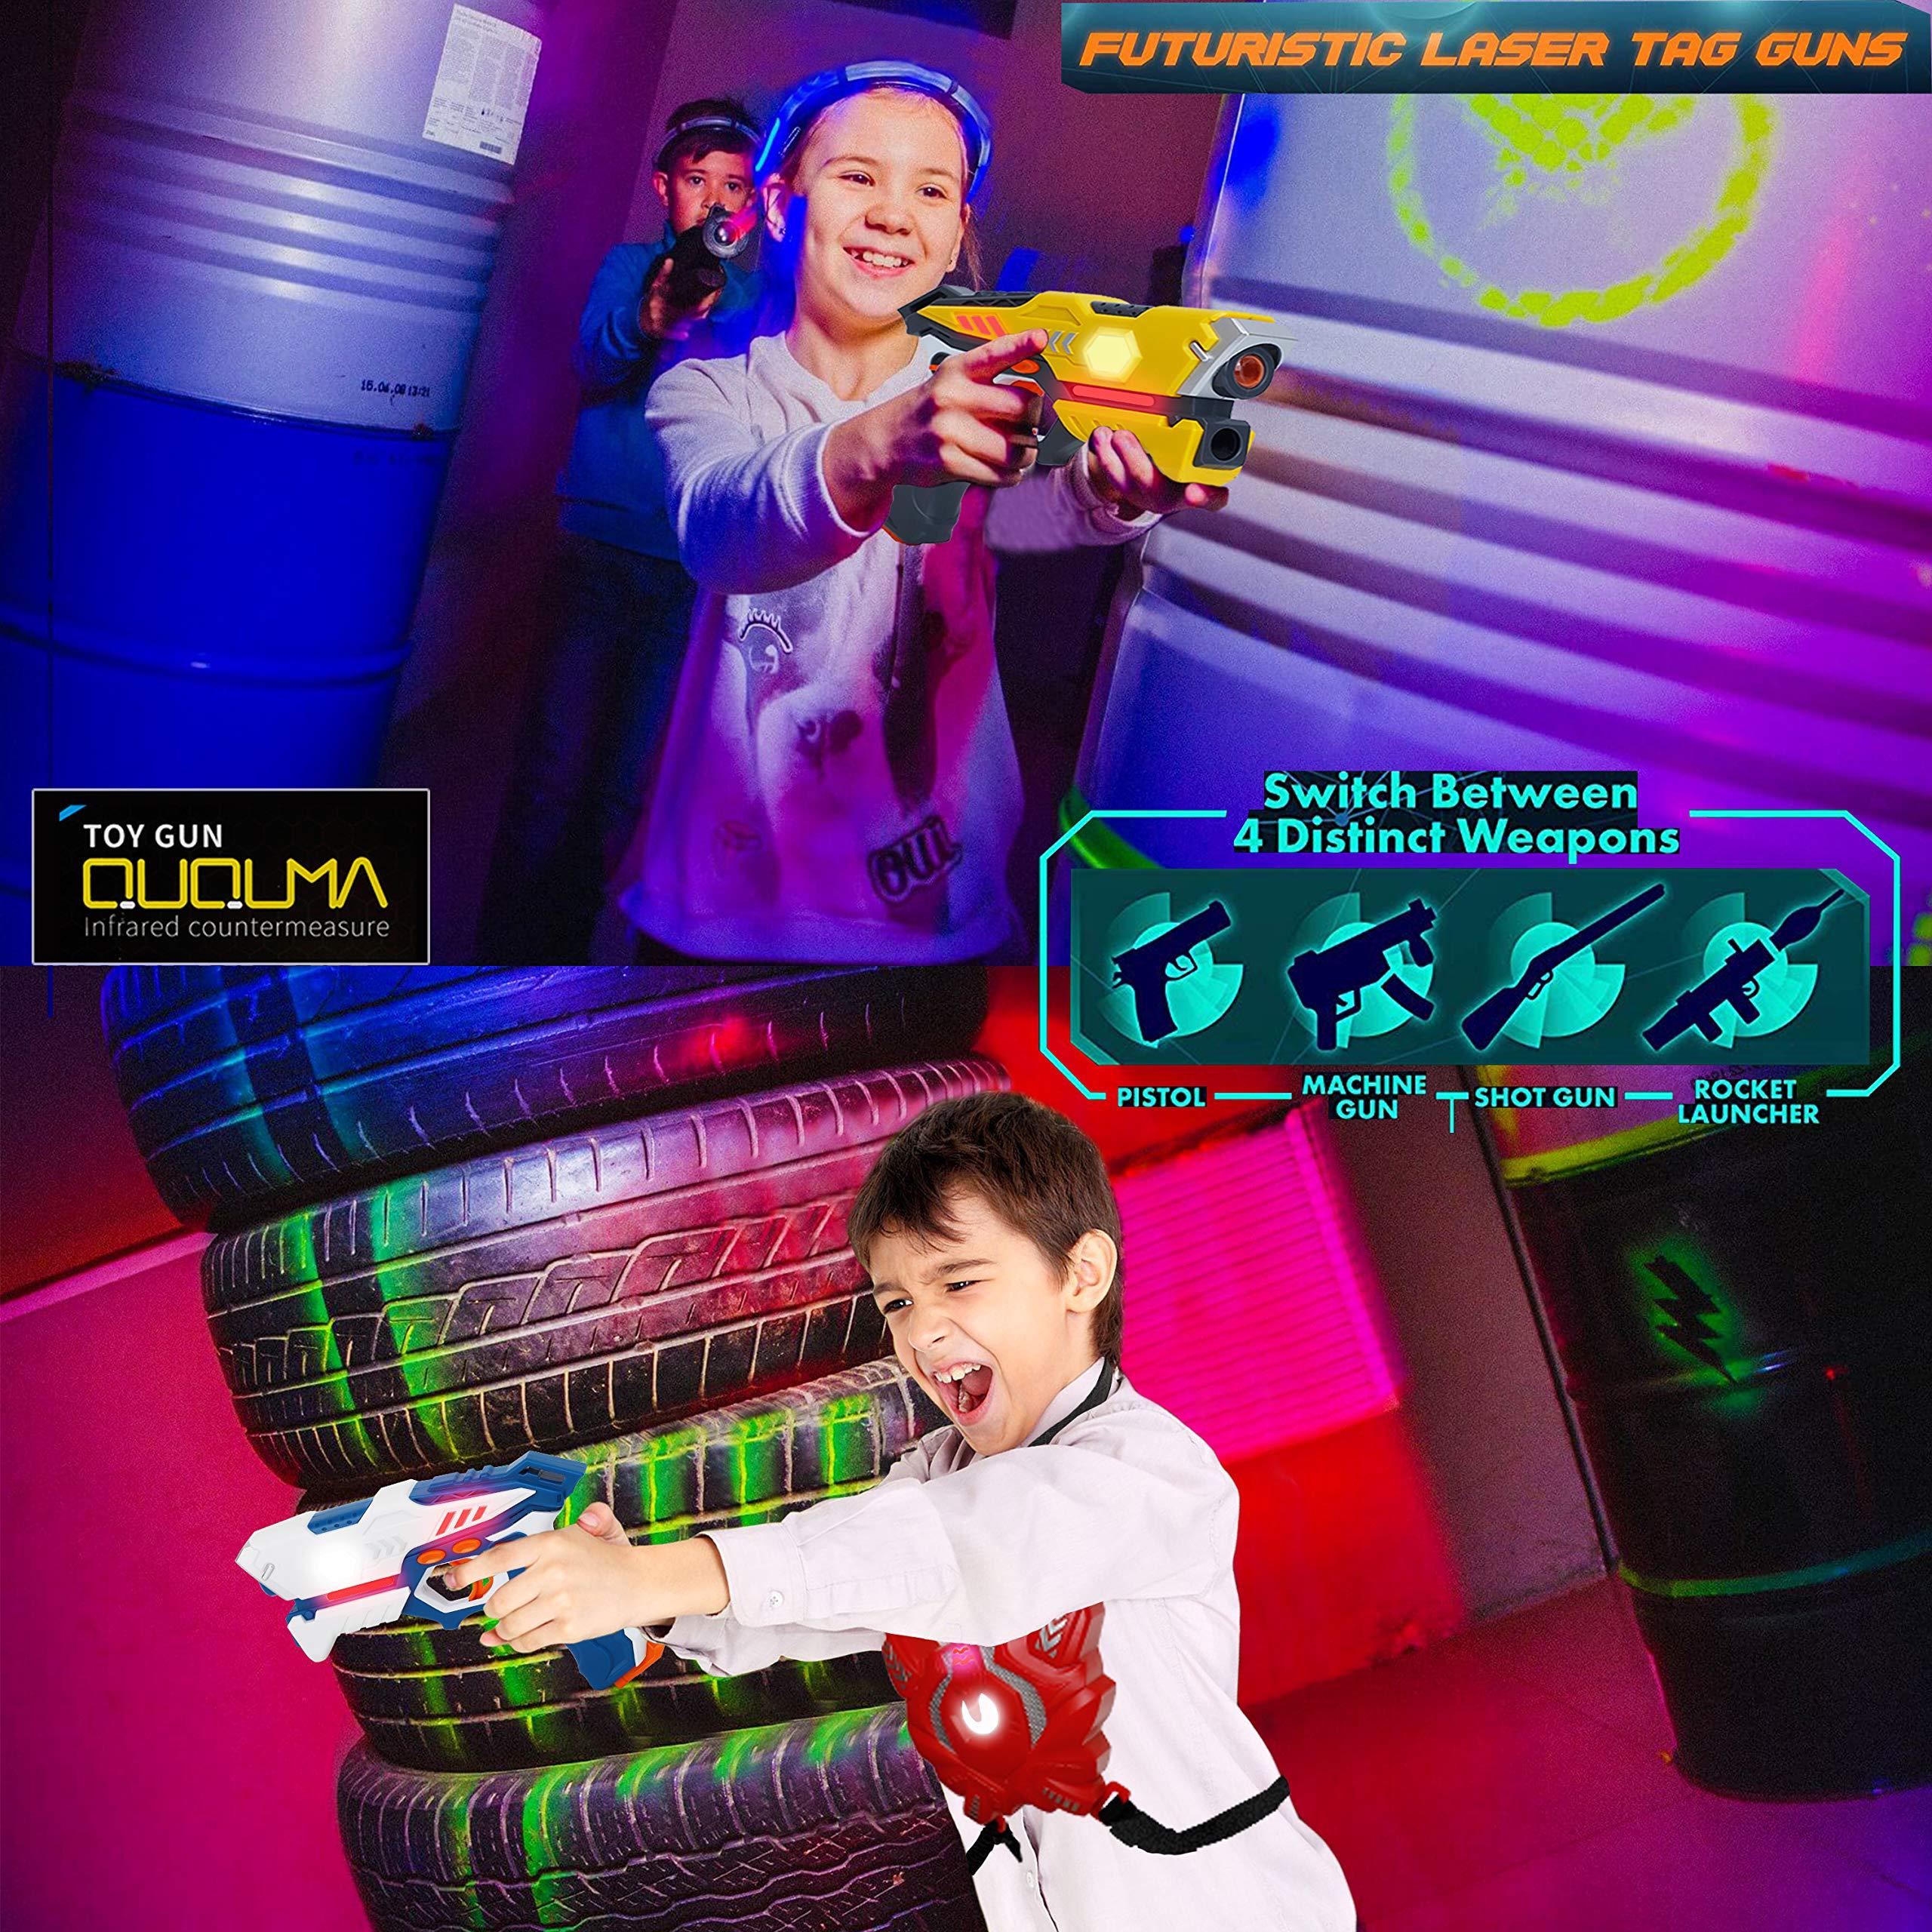 QUQUMA Infrared Laser Tag Set 4 Guns 4 Vests - Indoor Outdoor Laser Gun Kit Toy for Girl & Boy Laser Tag Game Set Best Gift Boys Girls(Laser Guns) by QUQUMA (Image #3)